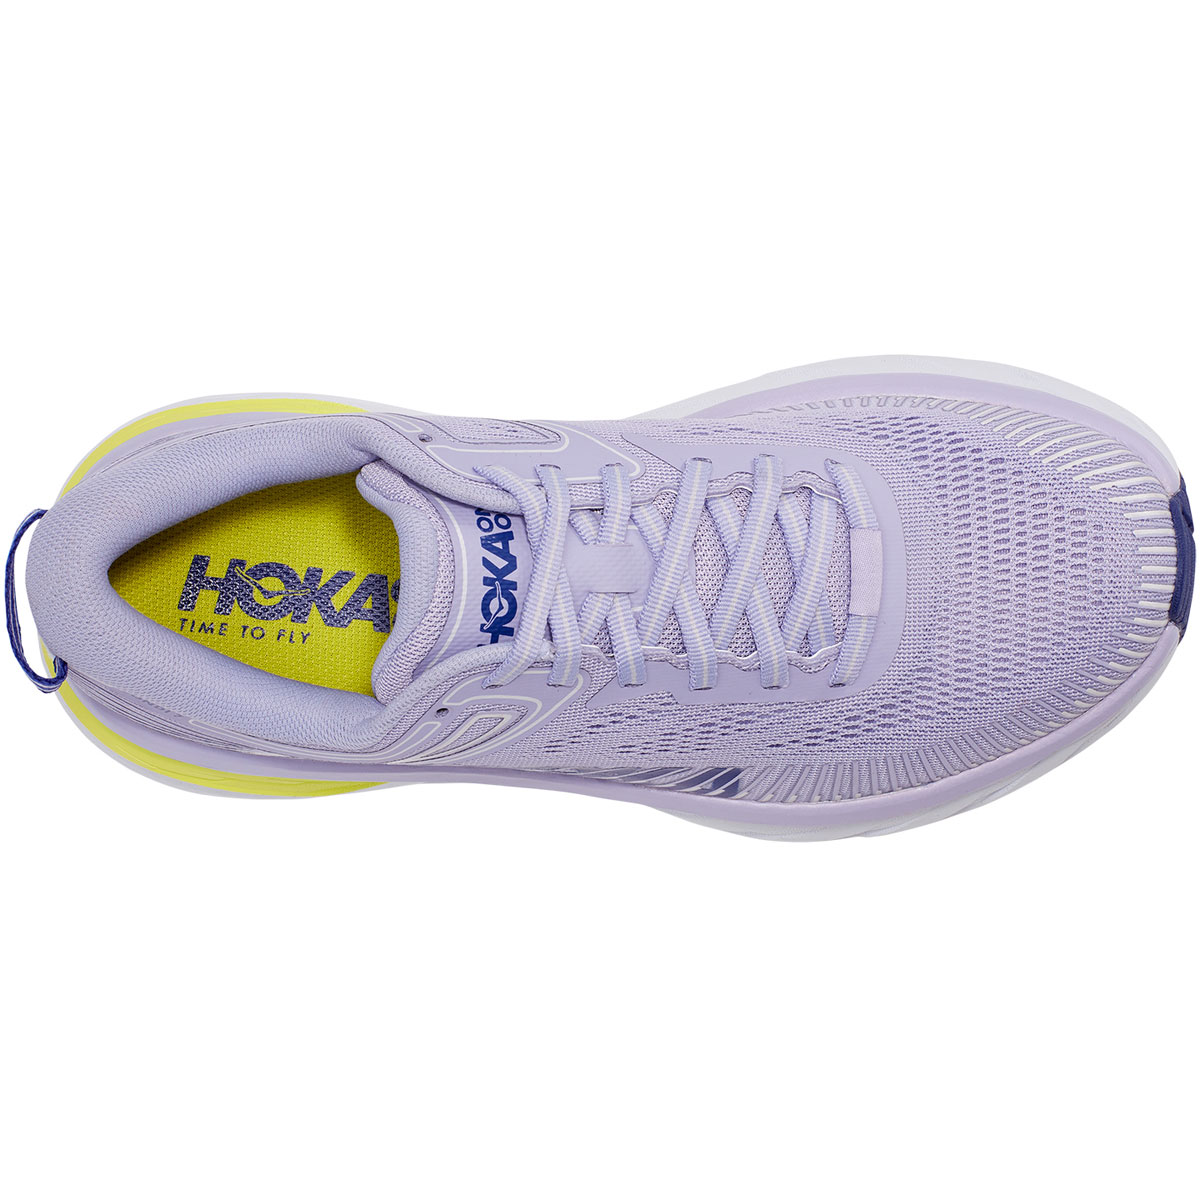 Women's Hoka One One Bondi 7 Running Shoe - Color: Purple Heather/Clematis Blue - Size: 5 - Width: Regular, Purple Heather/Clematis Blue, large, image 2